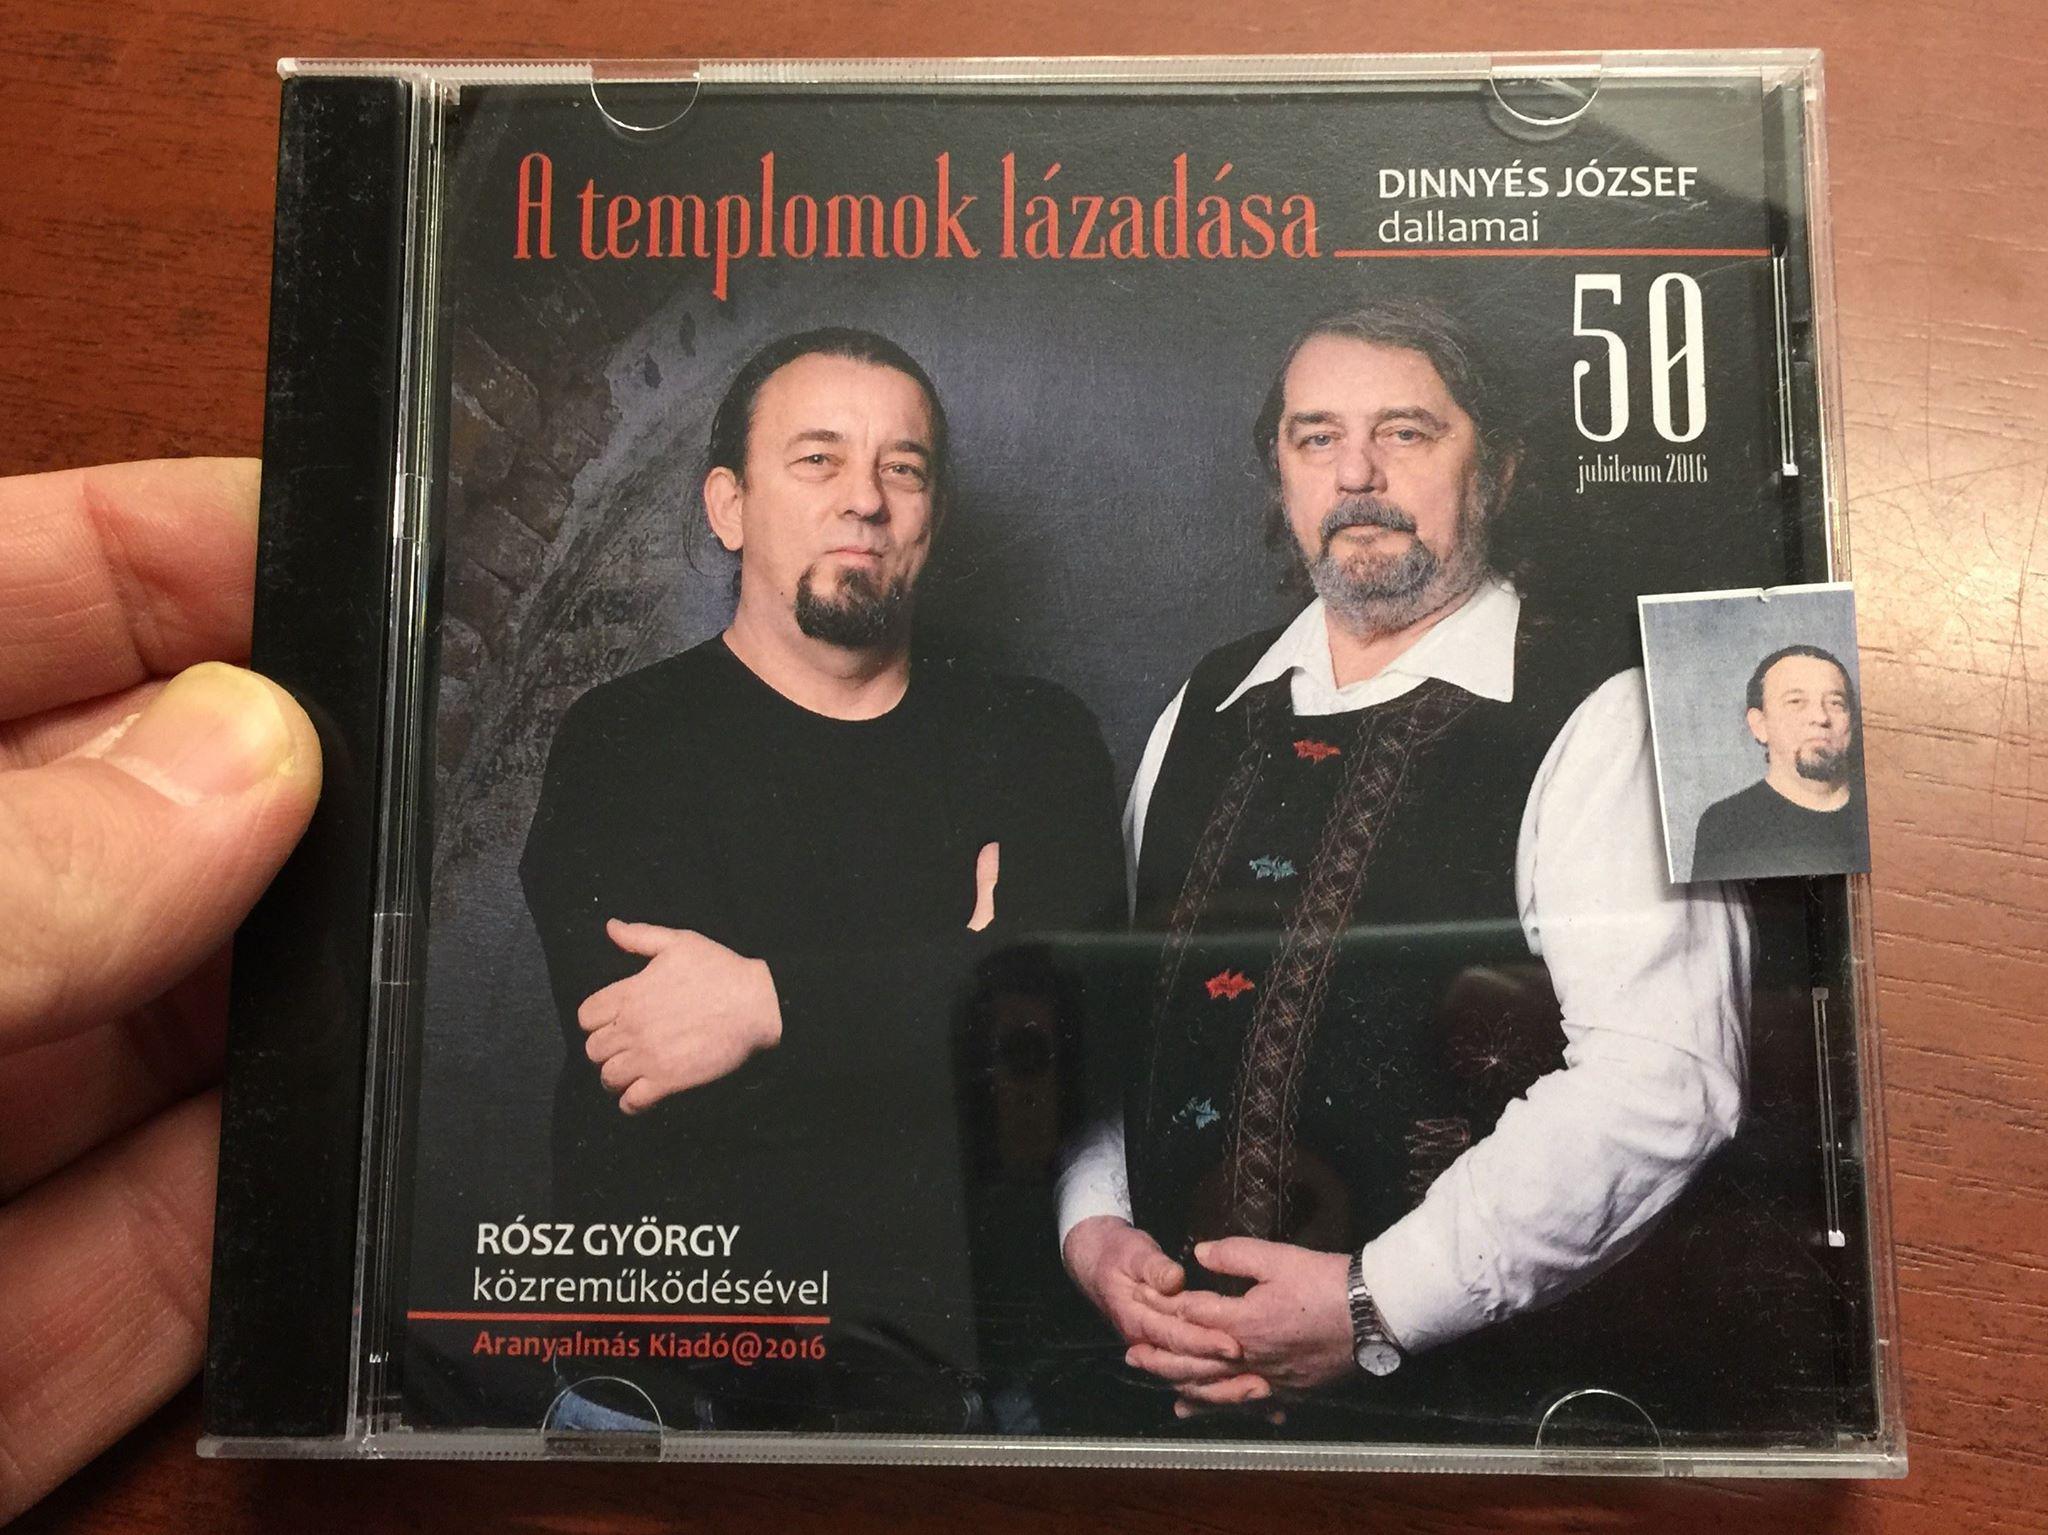 a-templomok-l-zad-sa-the-rebbelion-of-the-temples-dinny-s-j-zsef-r-sz-gy-rgy-hungarian-cd-2016-aranyalm-s-kiad-50-year-anniversary-recording-1-.jpg